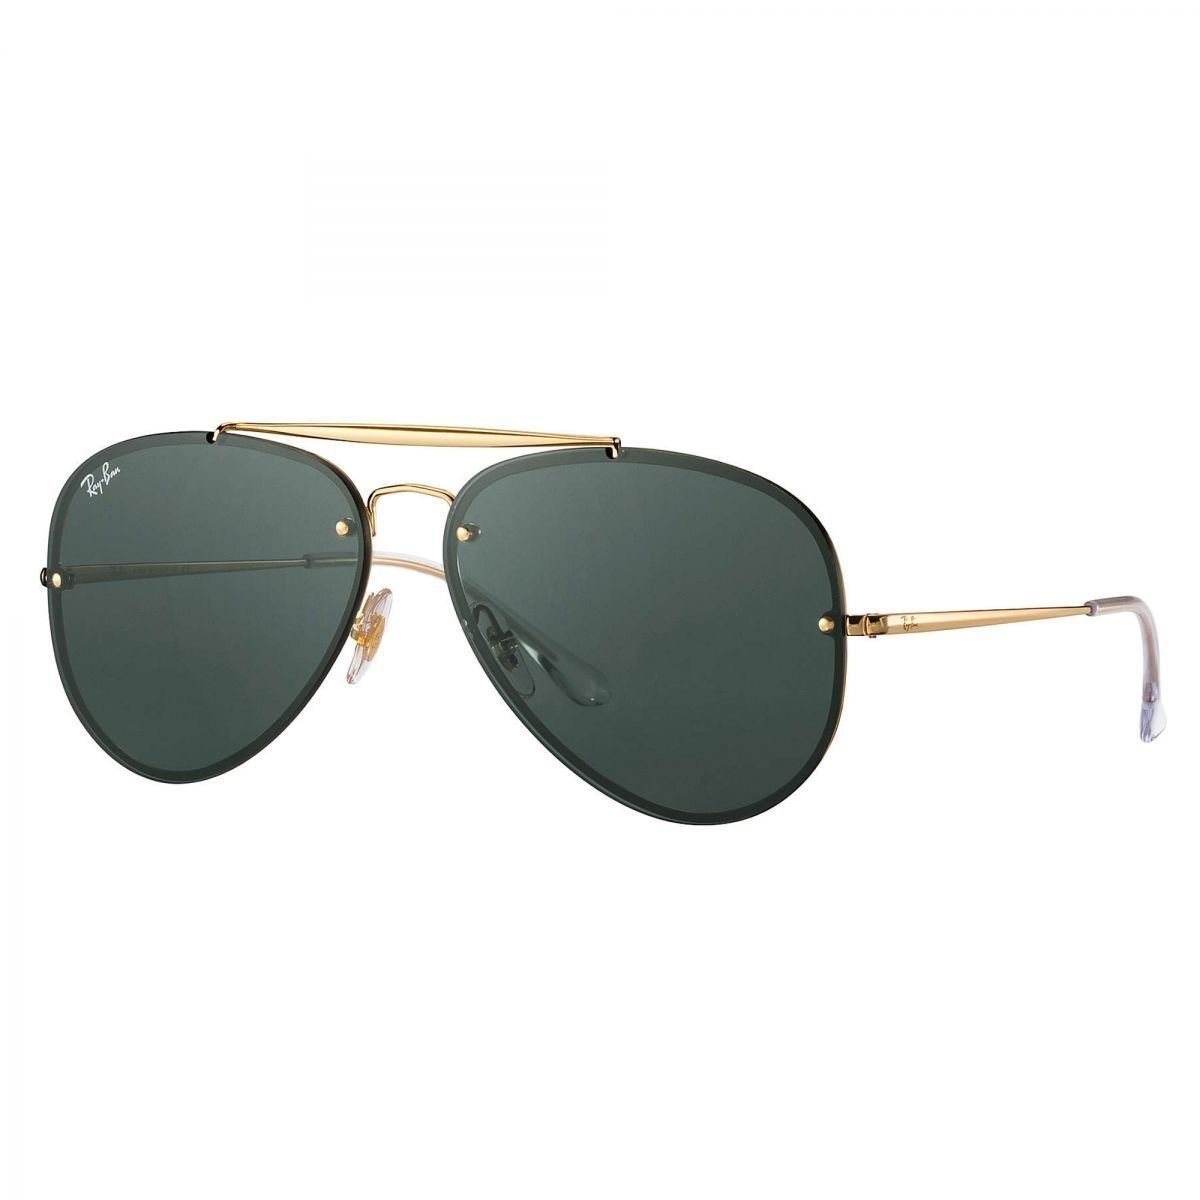 22fce91b2 سعر Ray-Ban Ray-Ban Sunglasses فى مصر | جوميا | نظارات | كان بكام